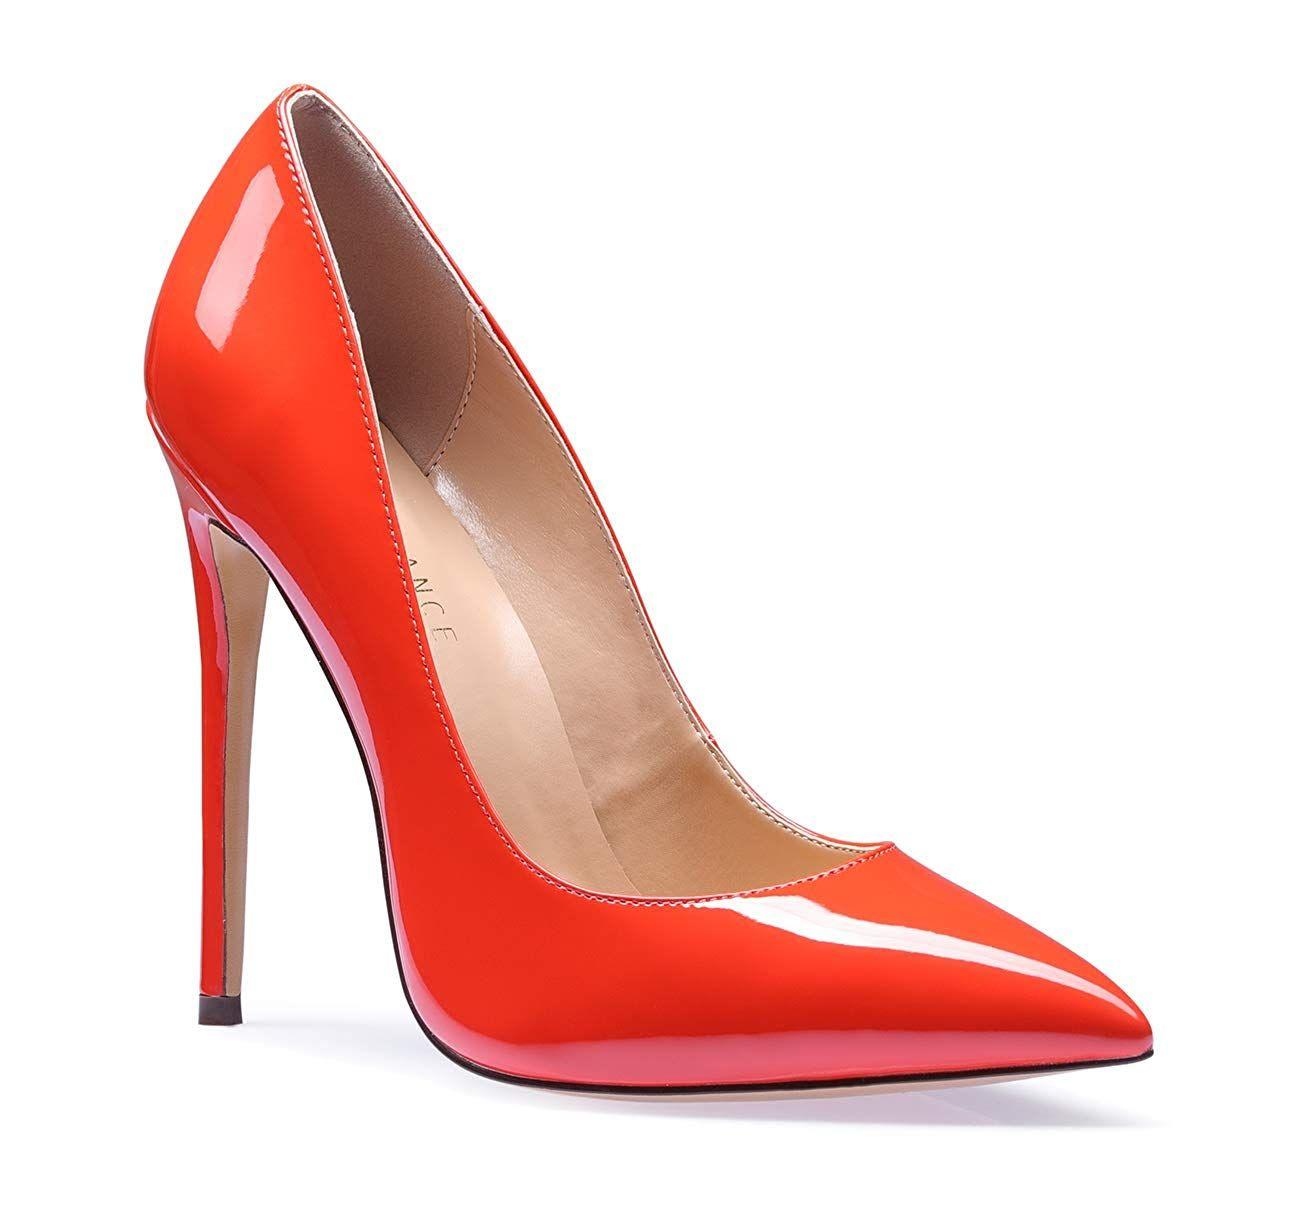 025f597343dcd $29.90 and up SUNETEDANCE Women's Slip-on Pumps High Heels Pointy ...